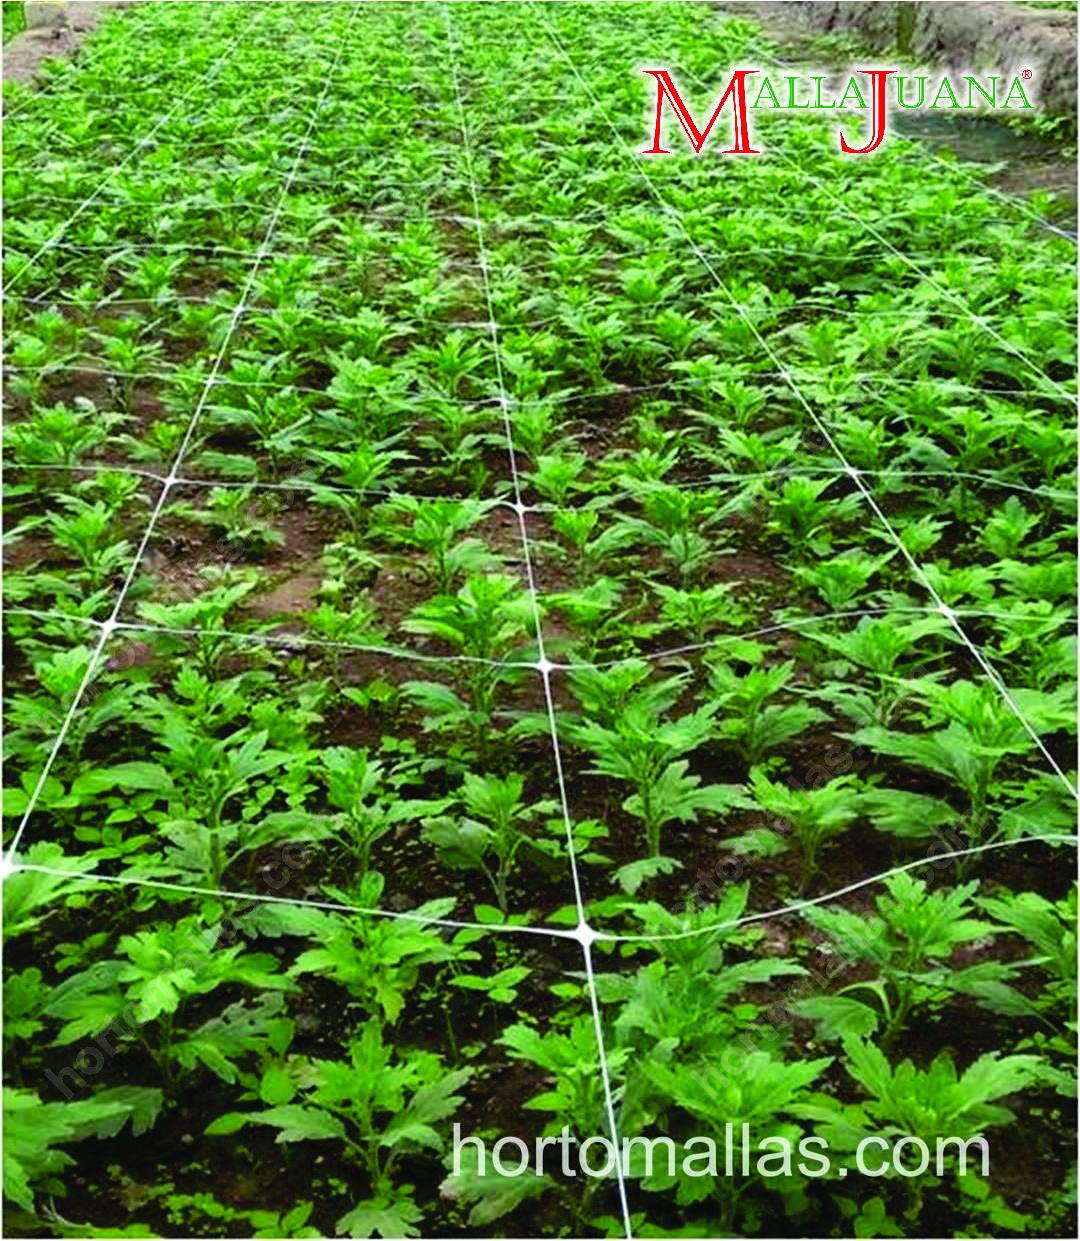 O método SCROG) (tela verde) utiliza uma malha/rede de plástico, chamada de MALLAJUANA® pela HORTOMALLAS®, para apoiar as plantas.